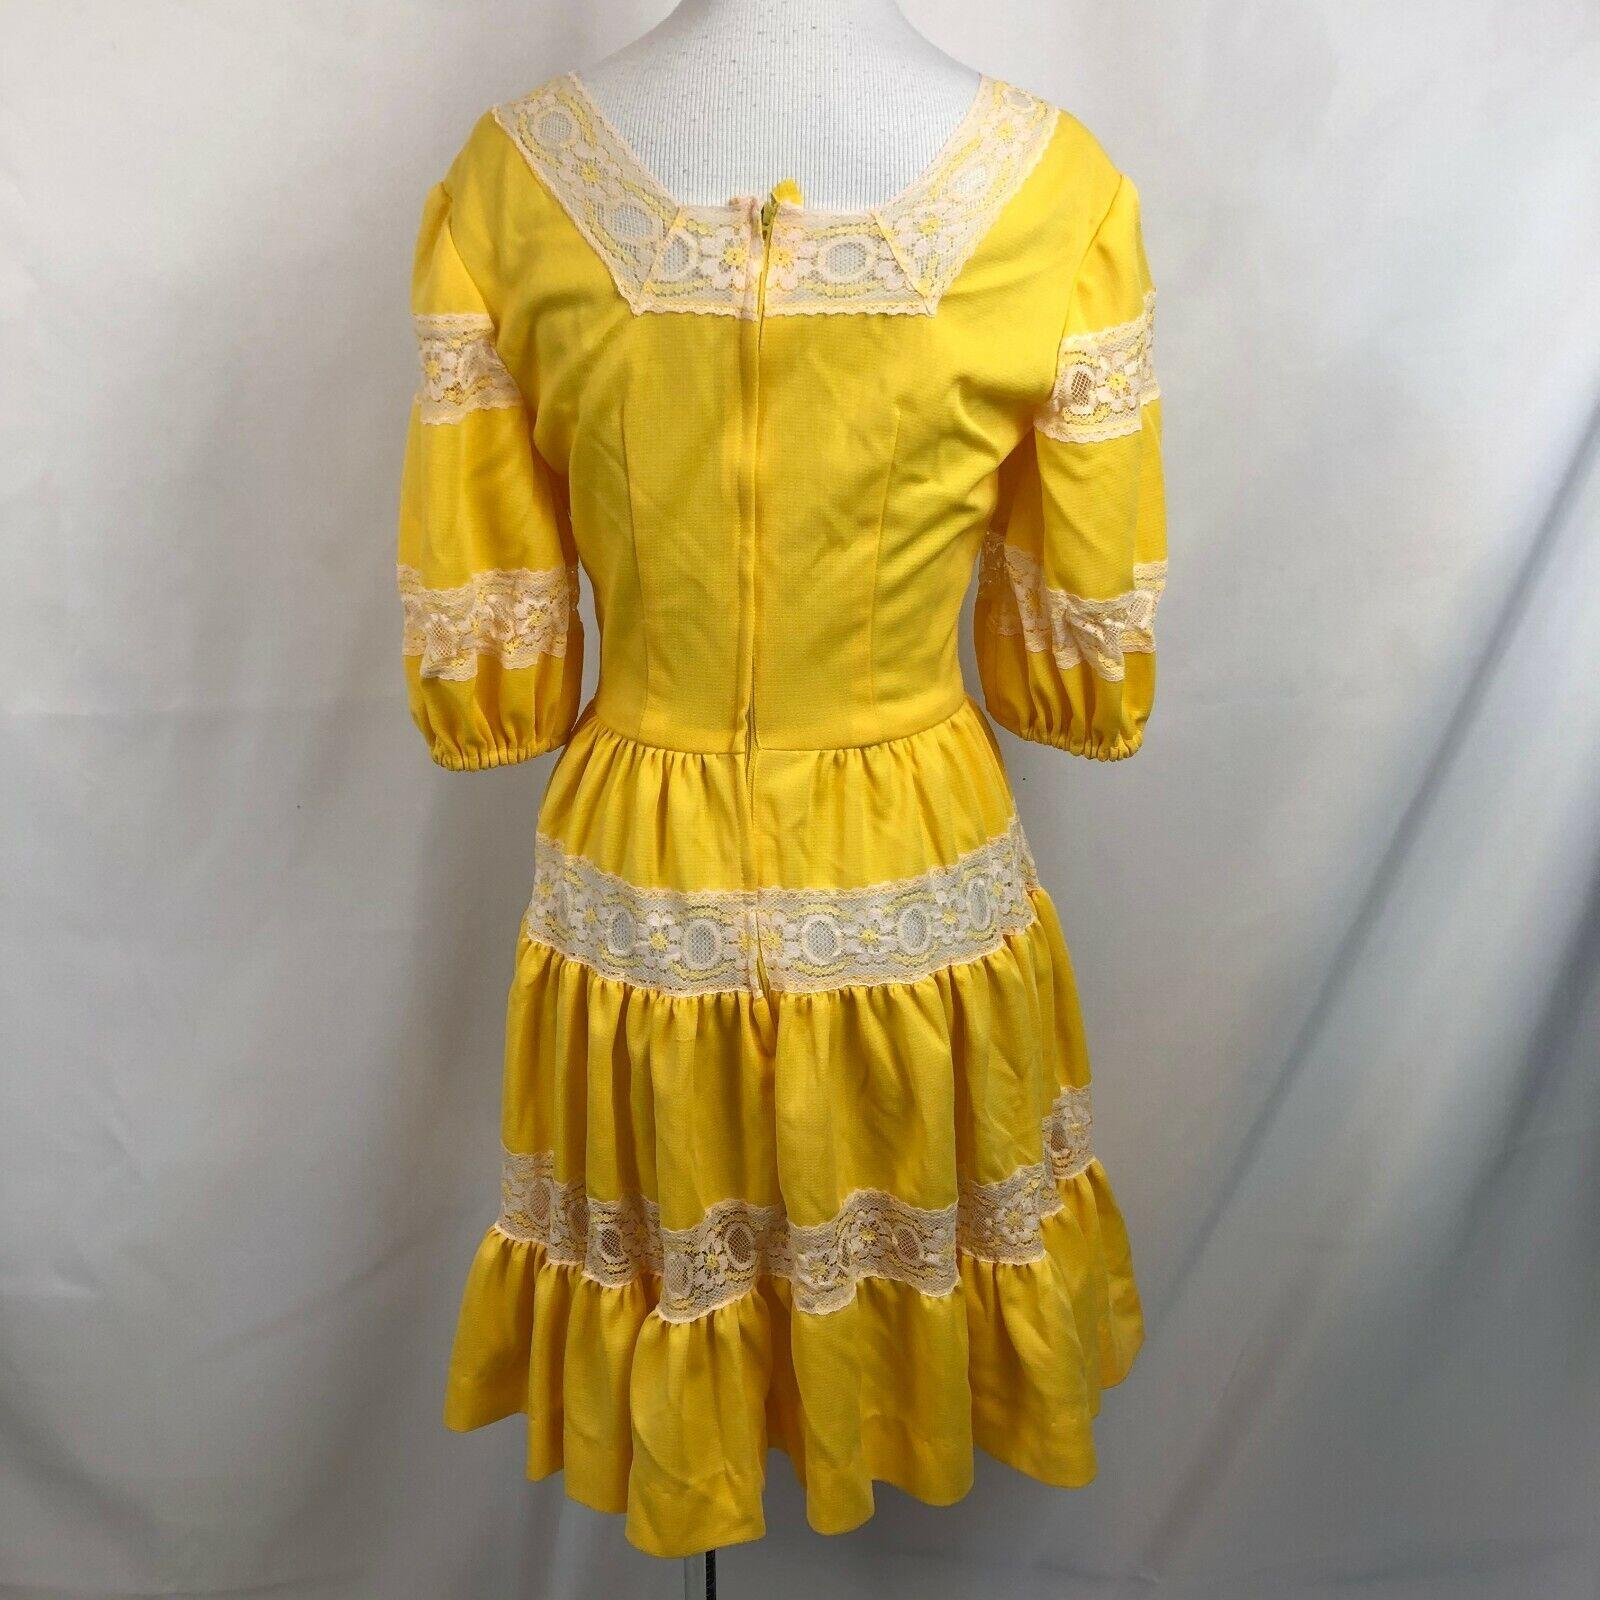 Vintage Lolita Dress Bright Yellow S/M See measur… - image 7